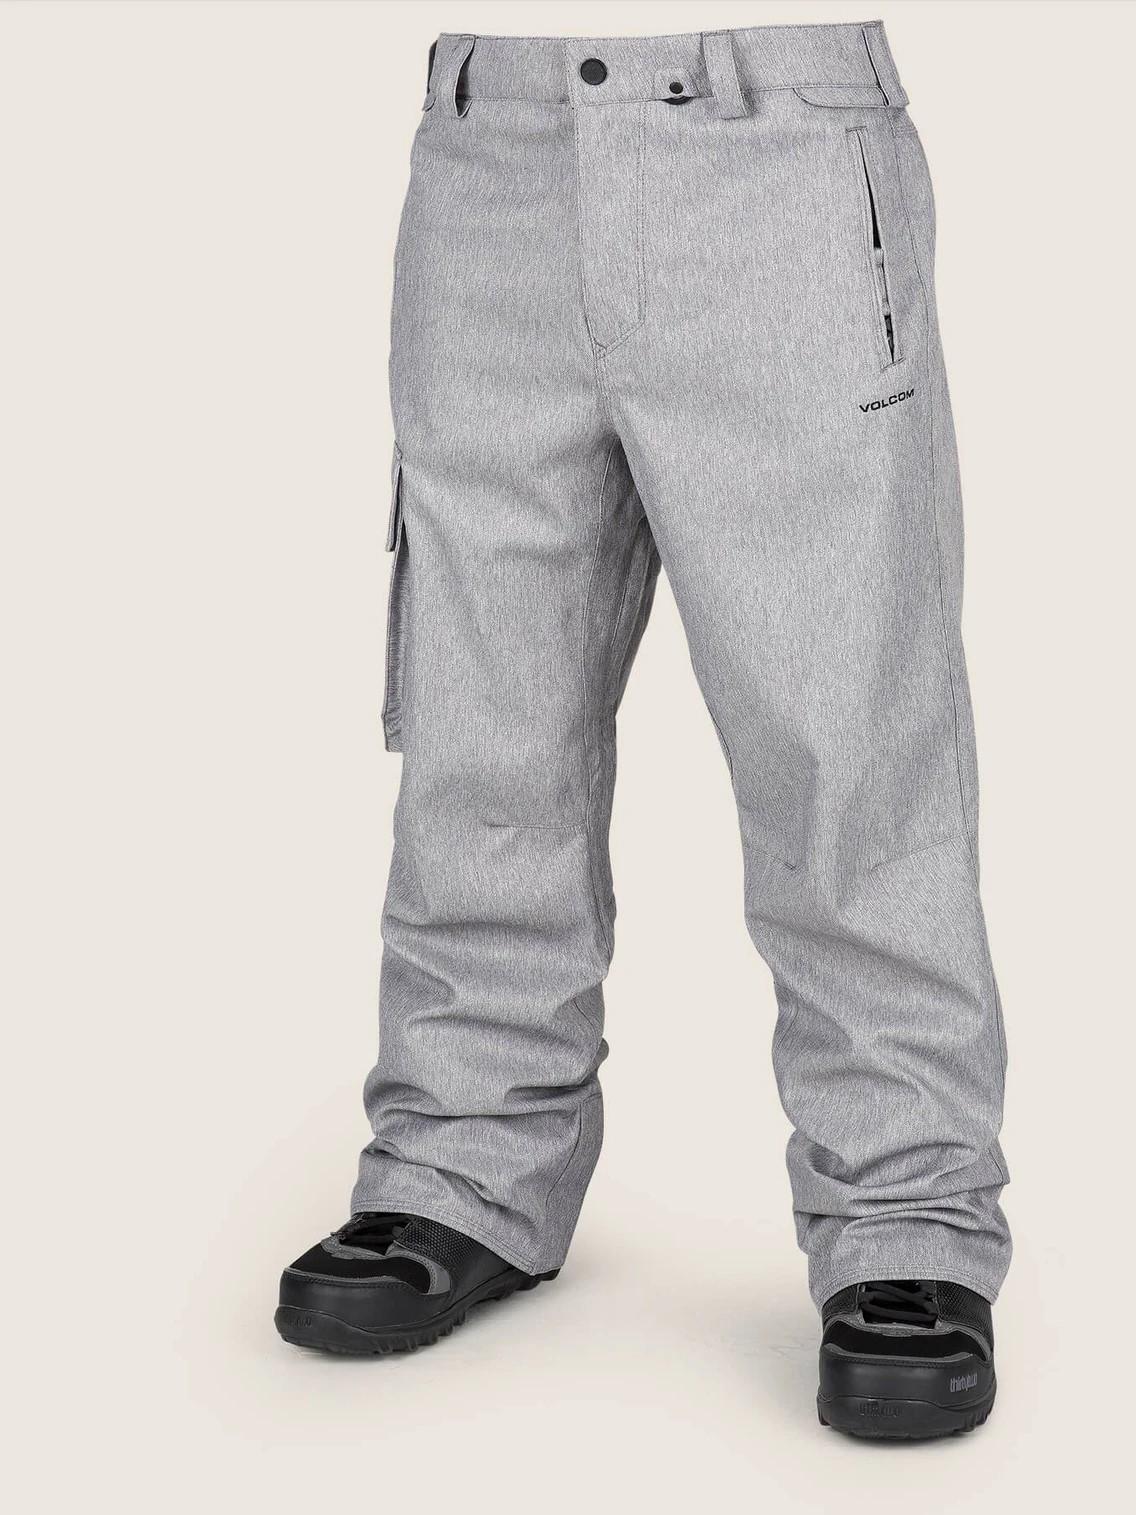 Брюки для сноуборда Volcom ASA040920-5 Серый Free Style